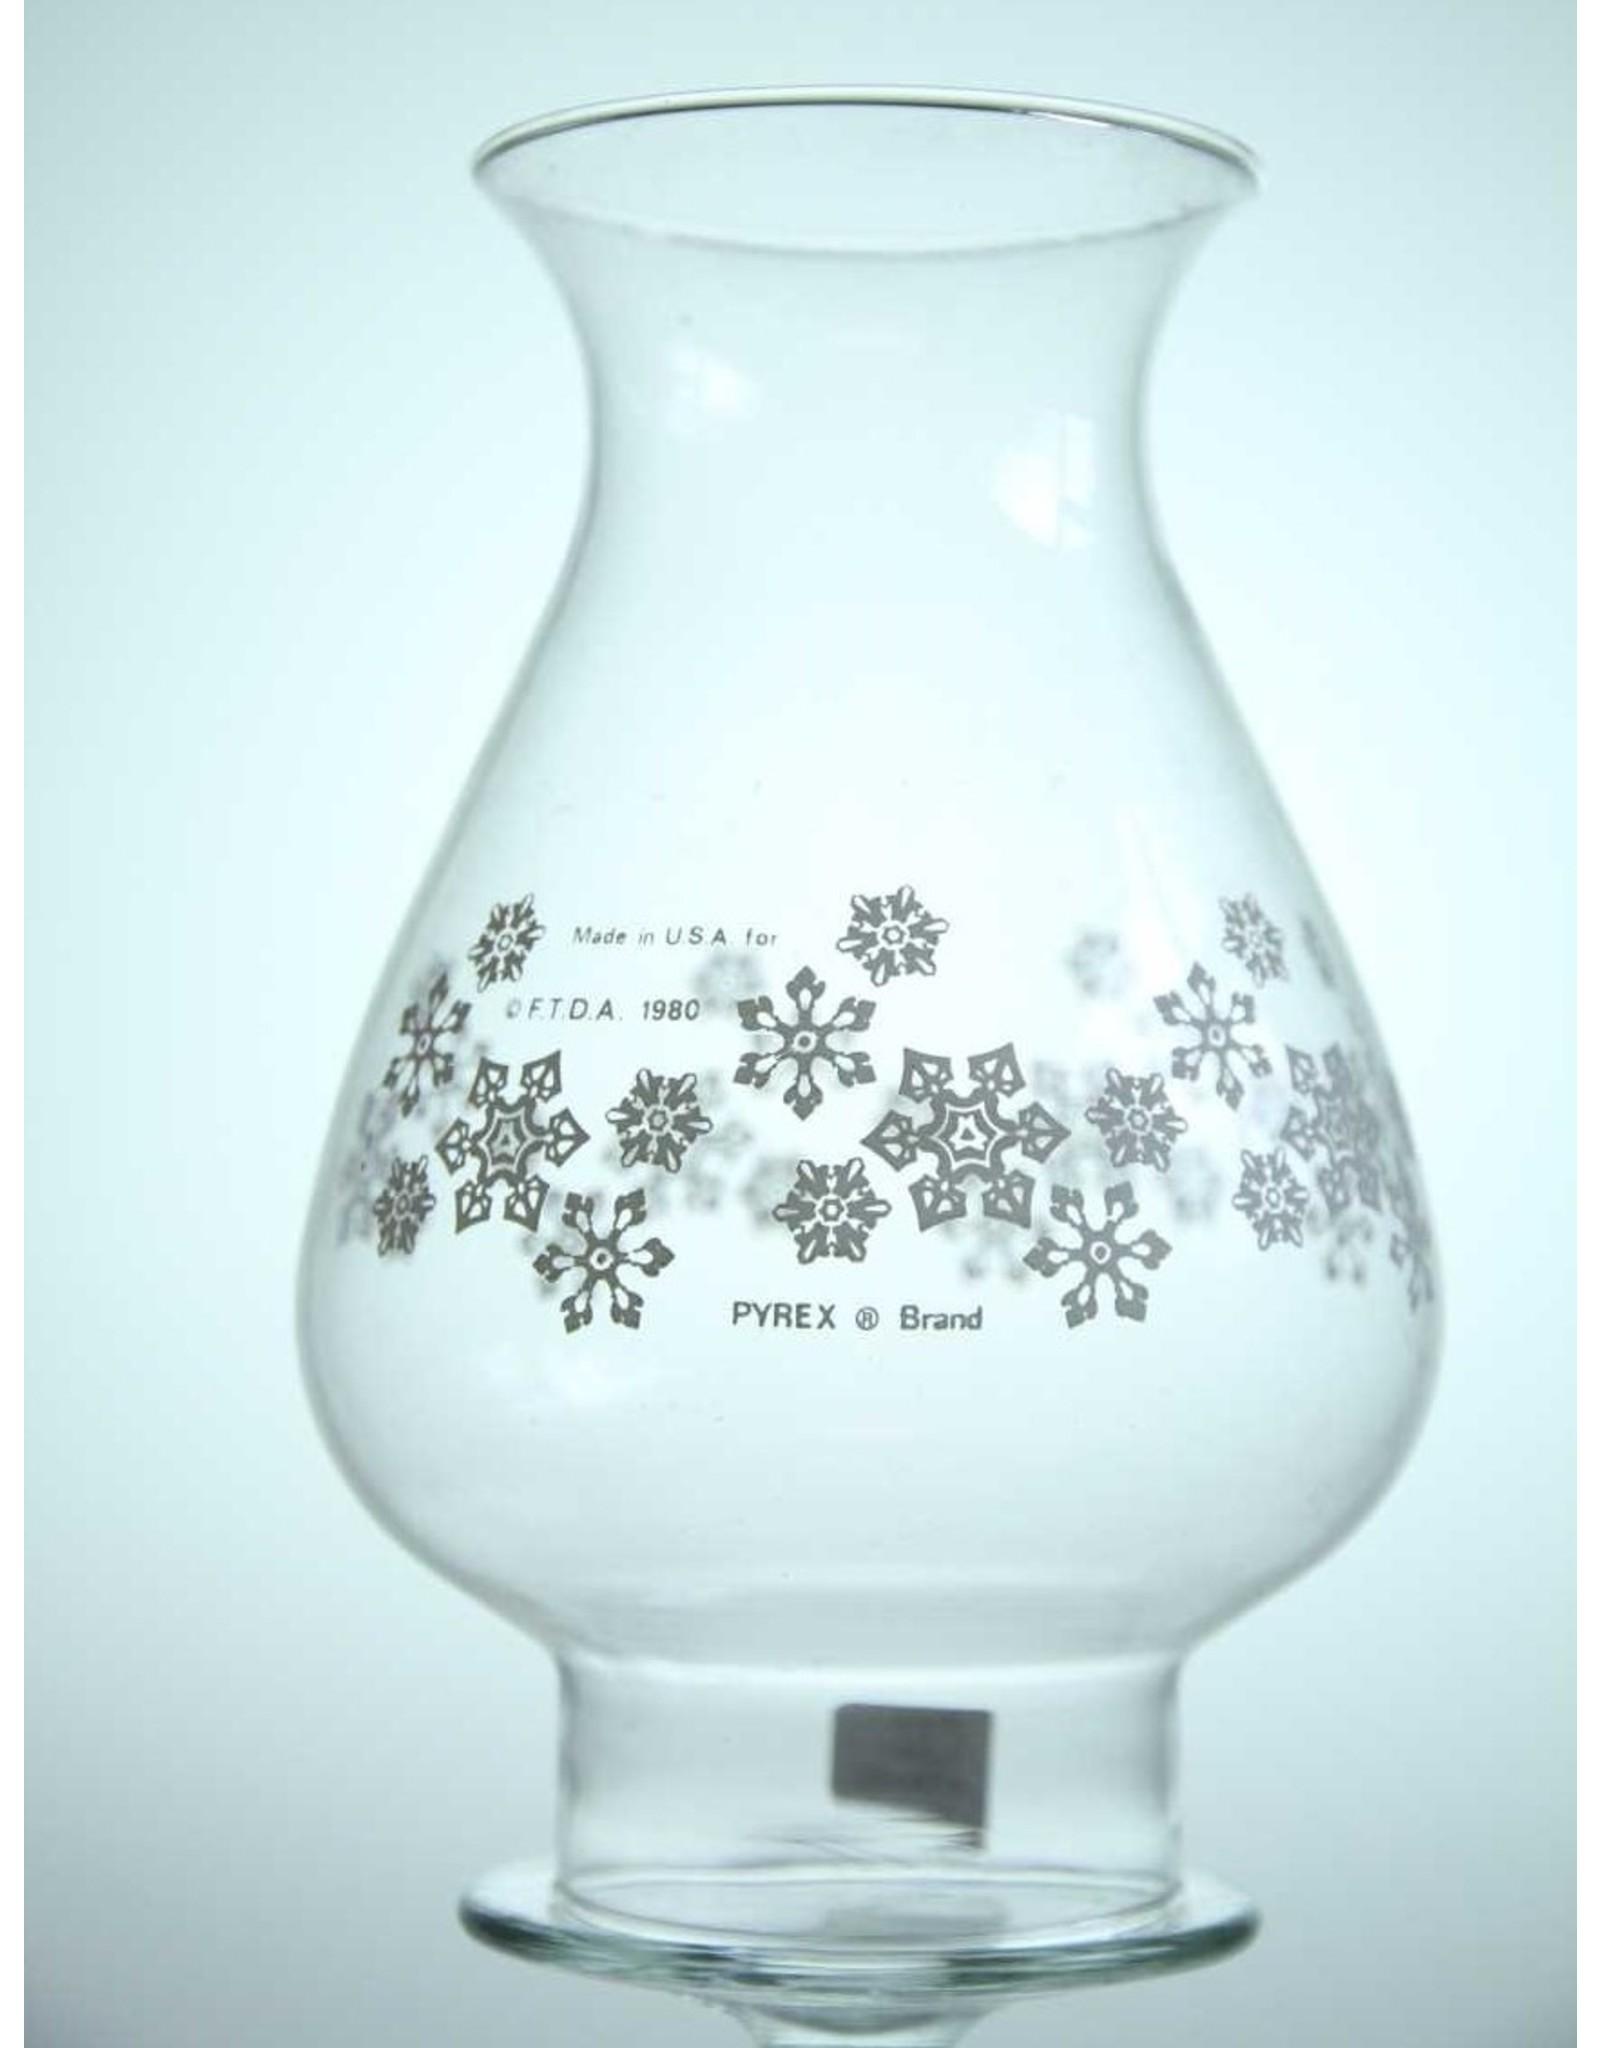 Chimney for oil lamp - Pyrex snowflake design